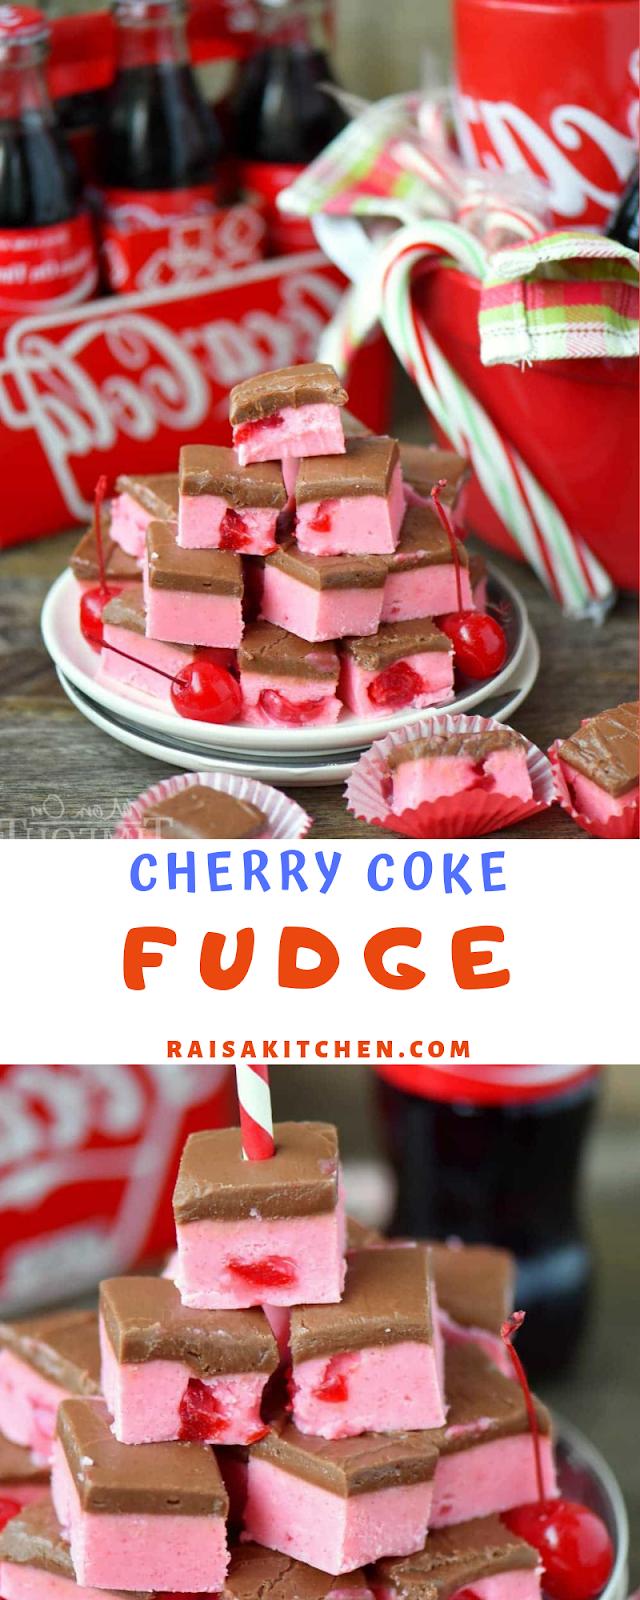 CHERRY COKE FUDGE